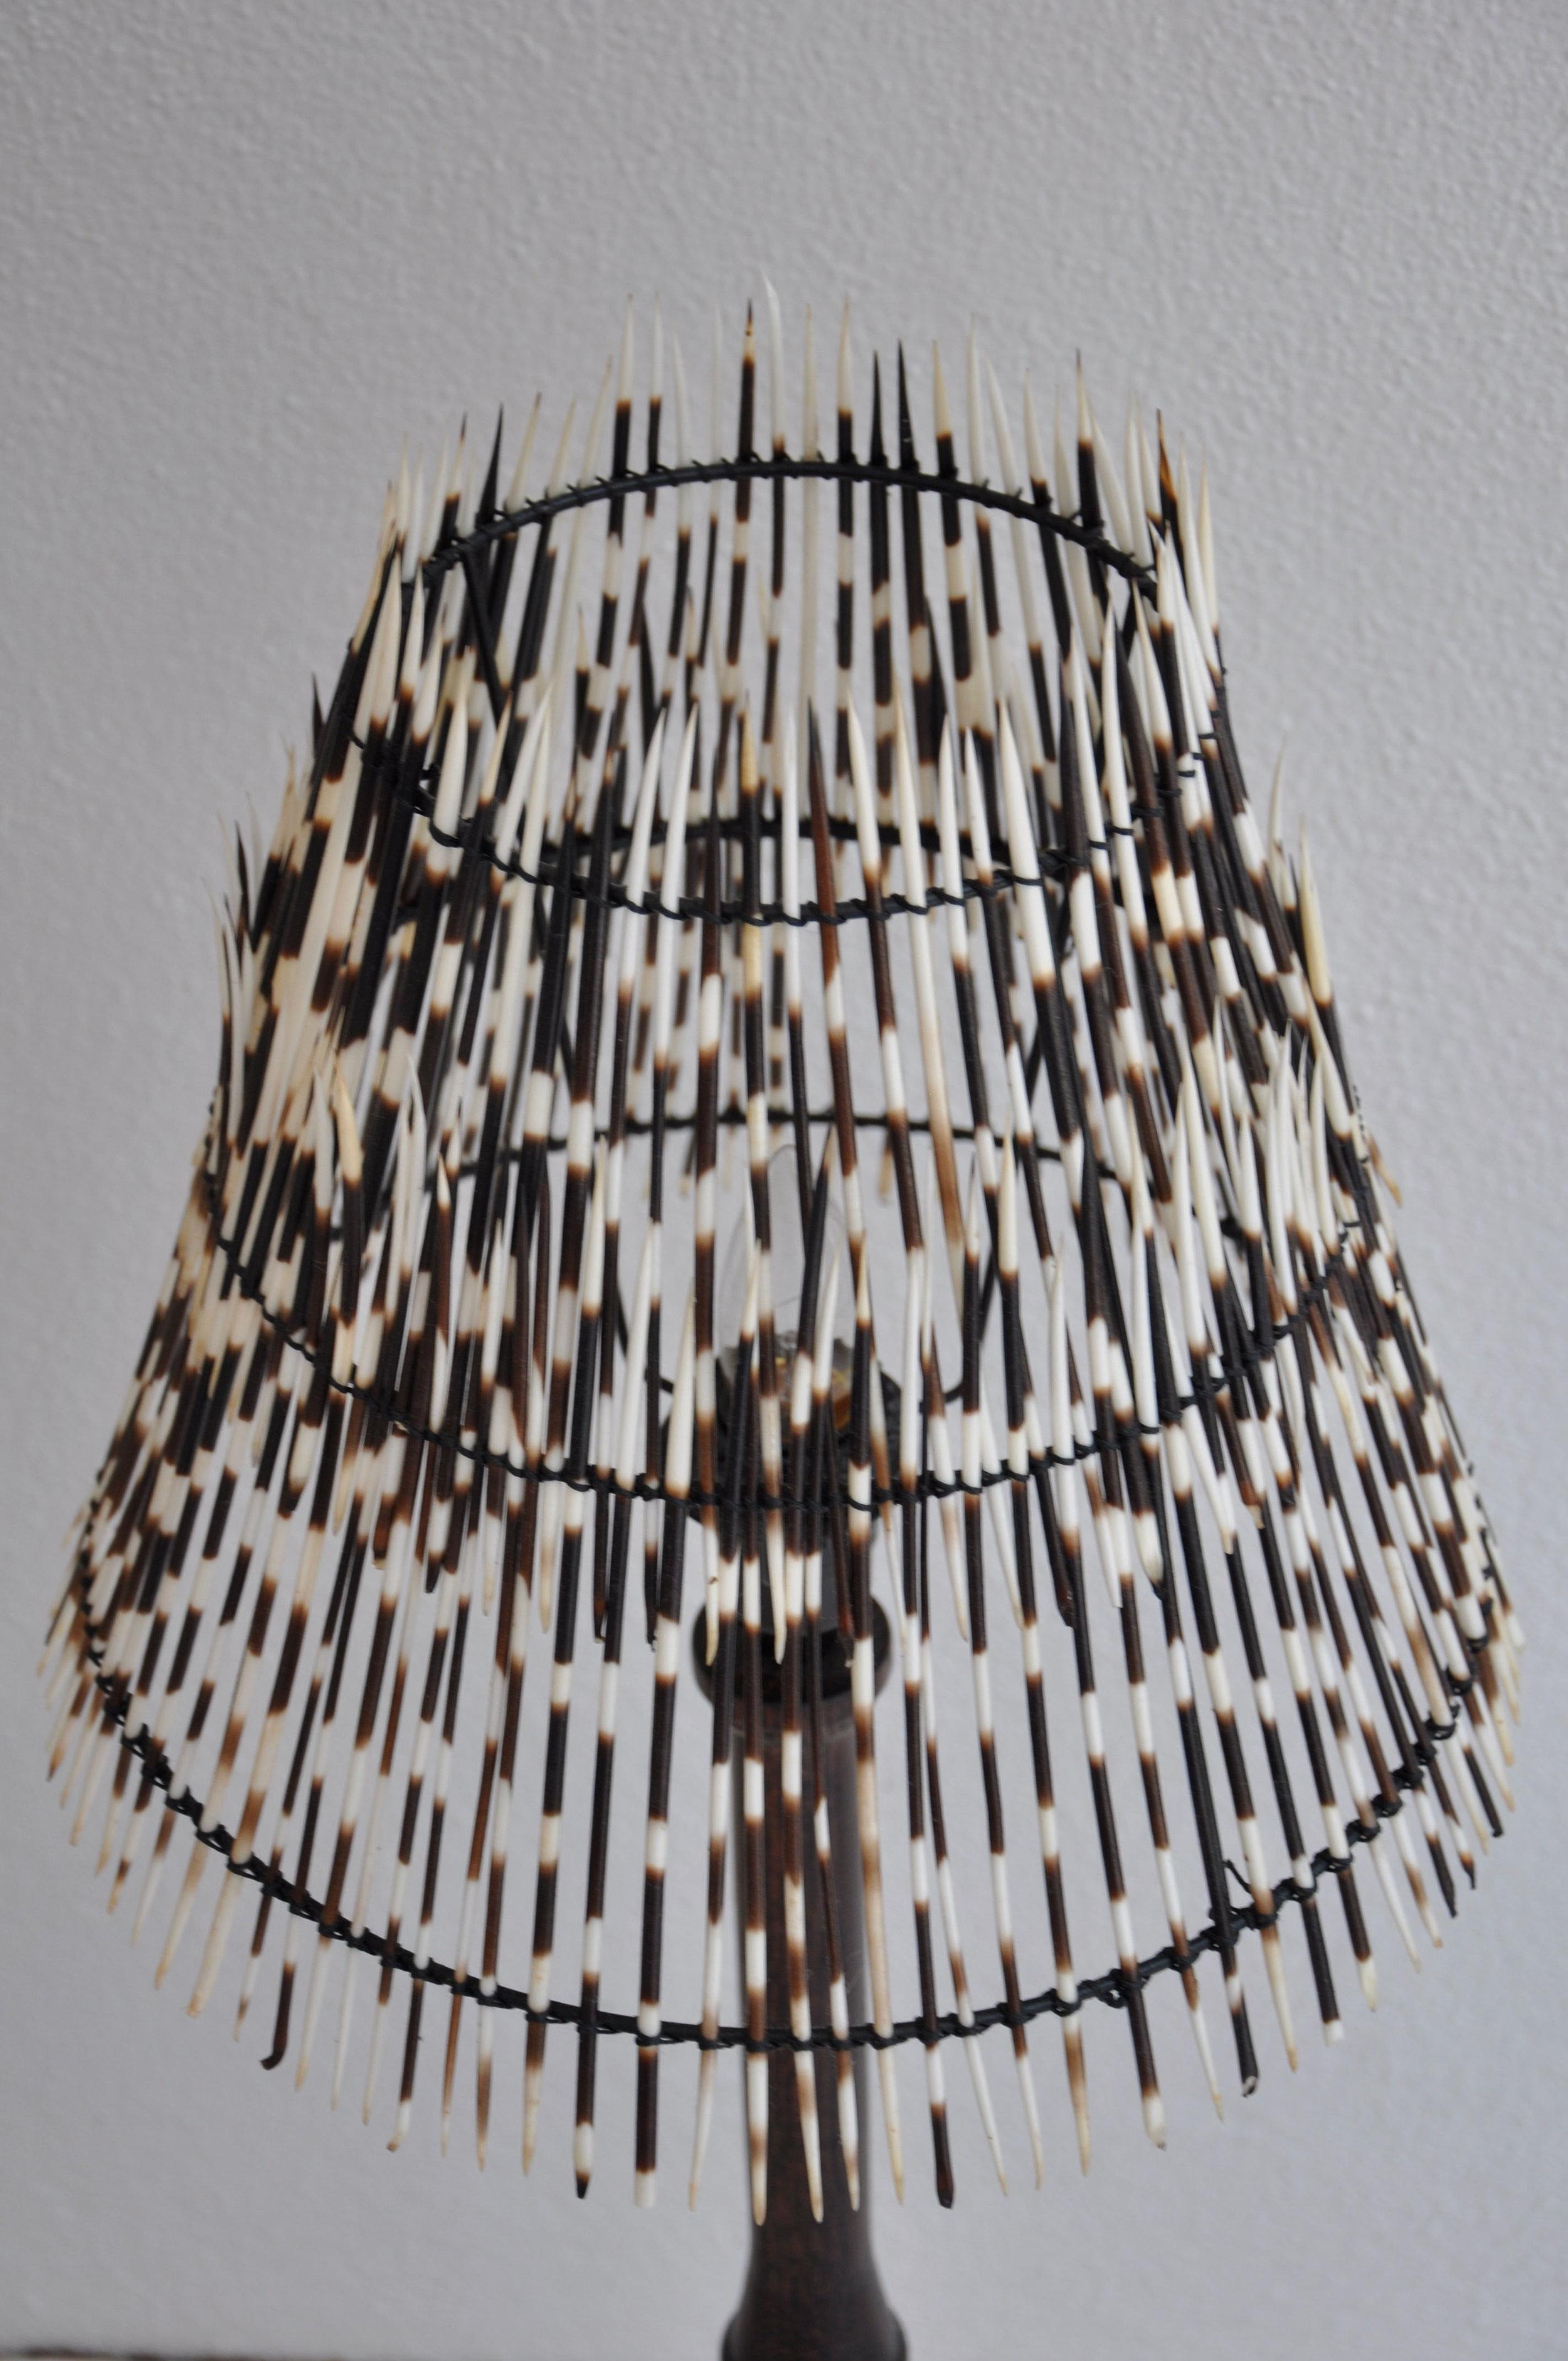 PORCUPINE LAMPS 3.jpg